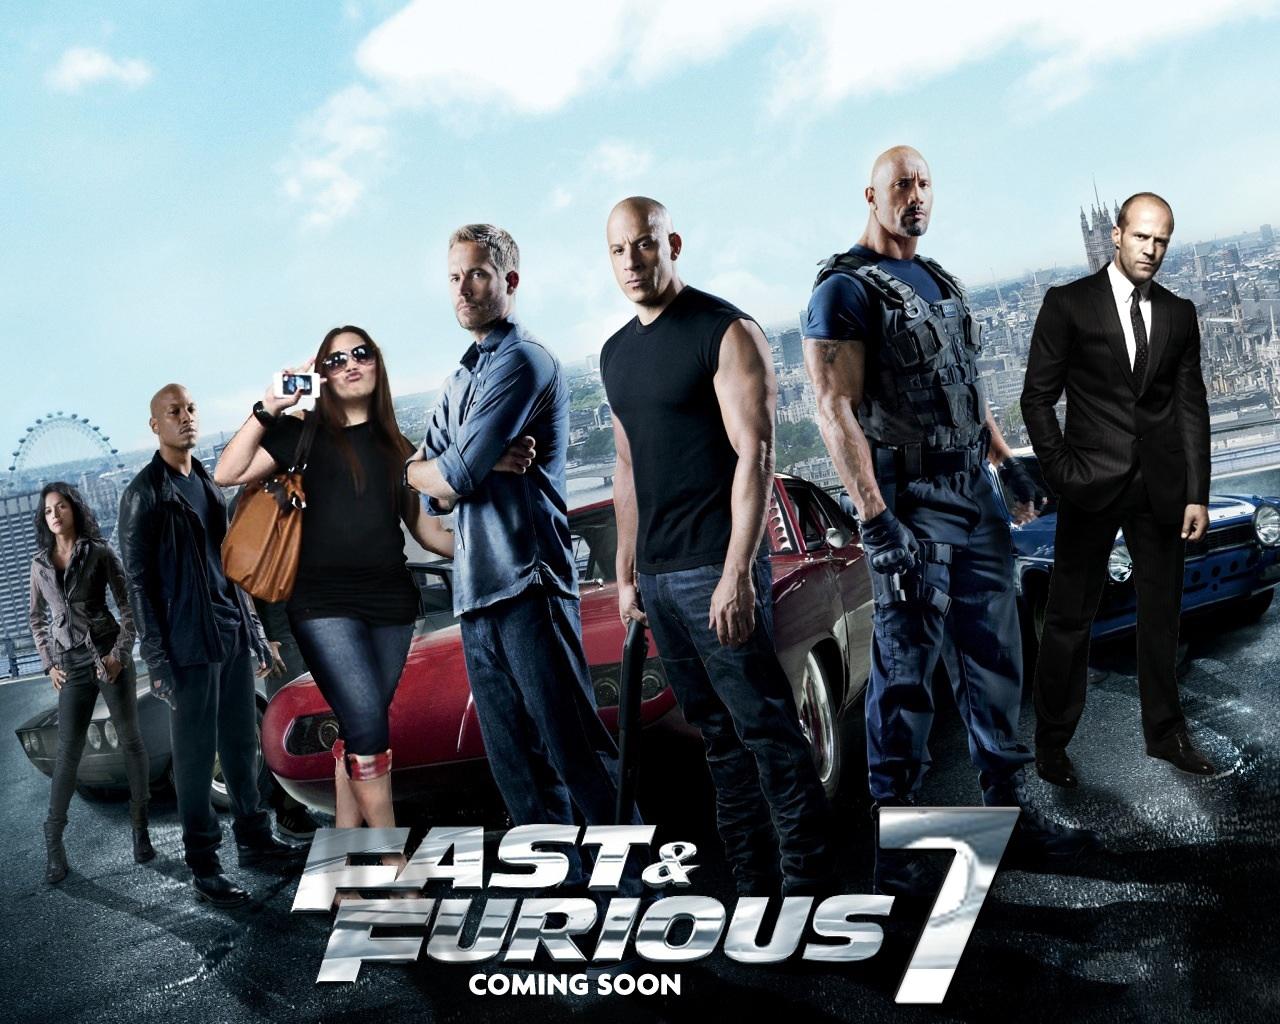 fast furious 7 fast and furious 7 fast and furious